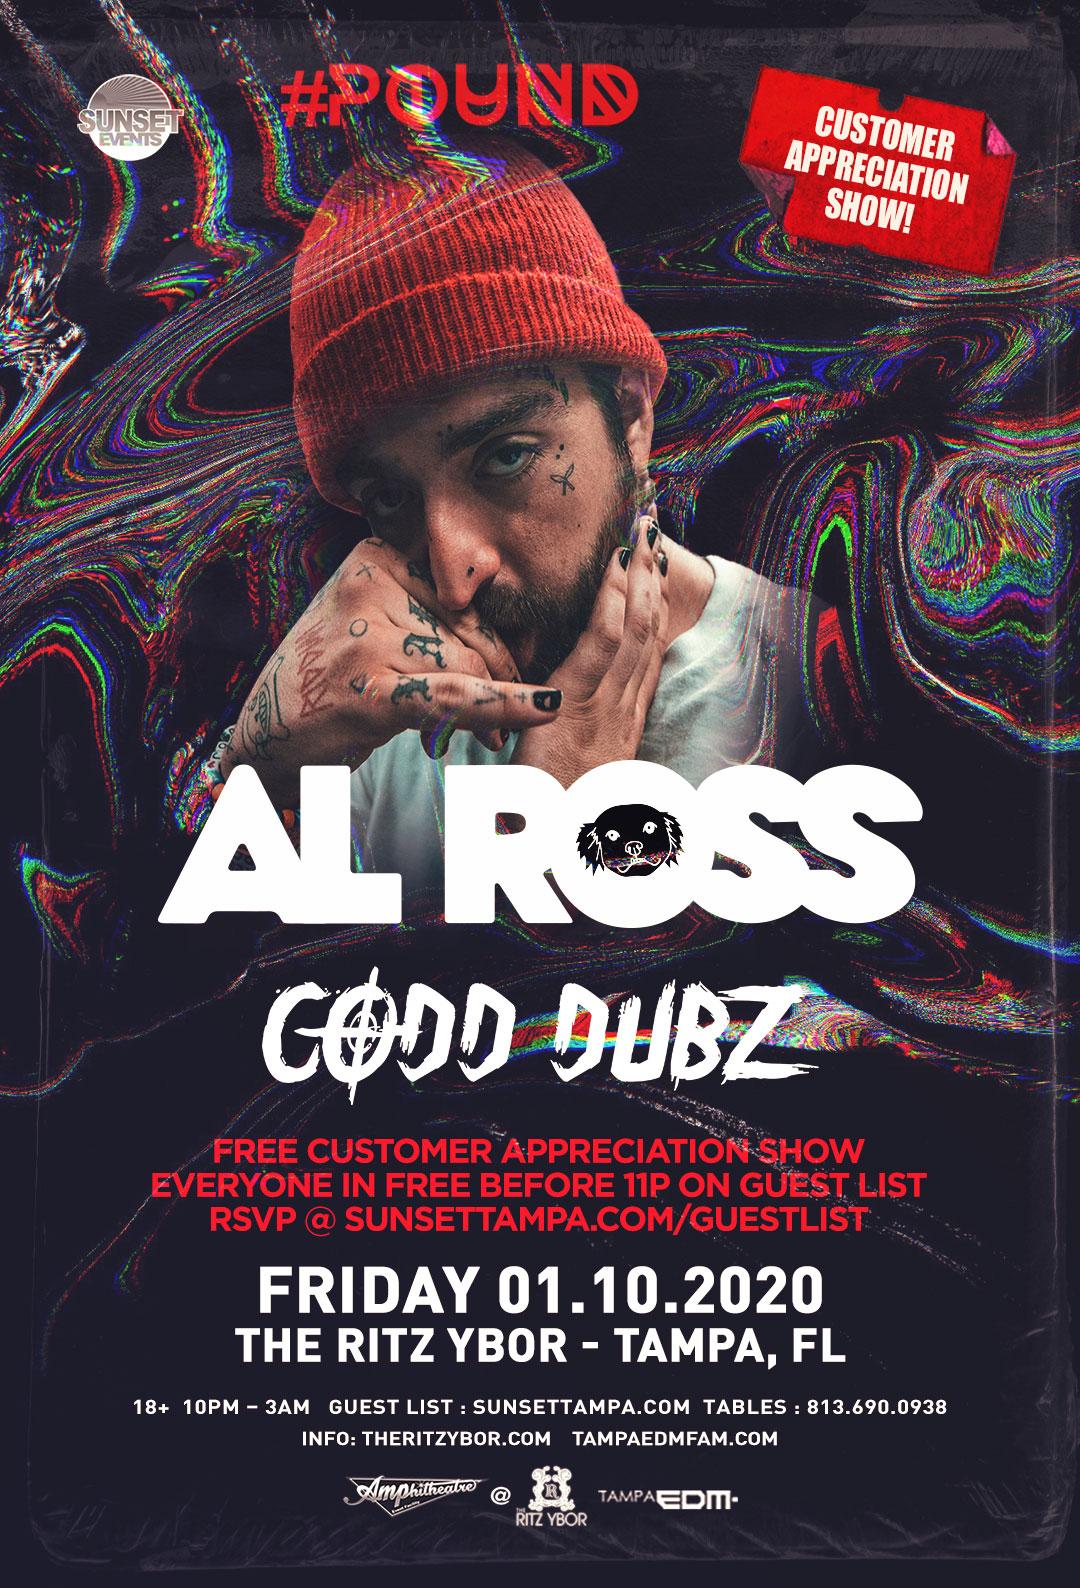 Al Ross + Codd Dubz – Free Guest List – #POUND FRIDAYS at The RITZ Ybor – 1/10/2020